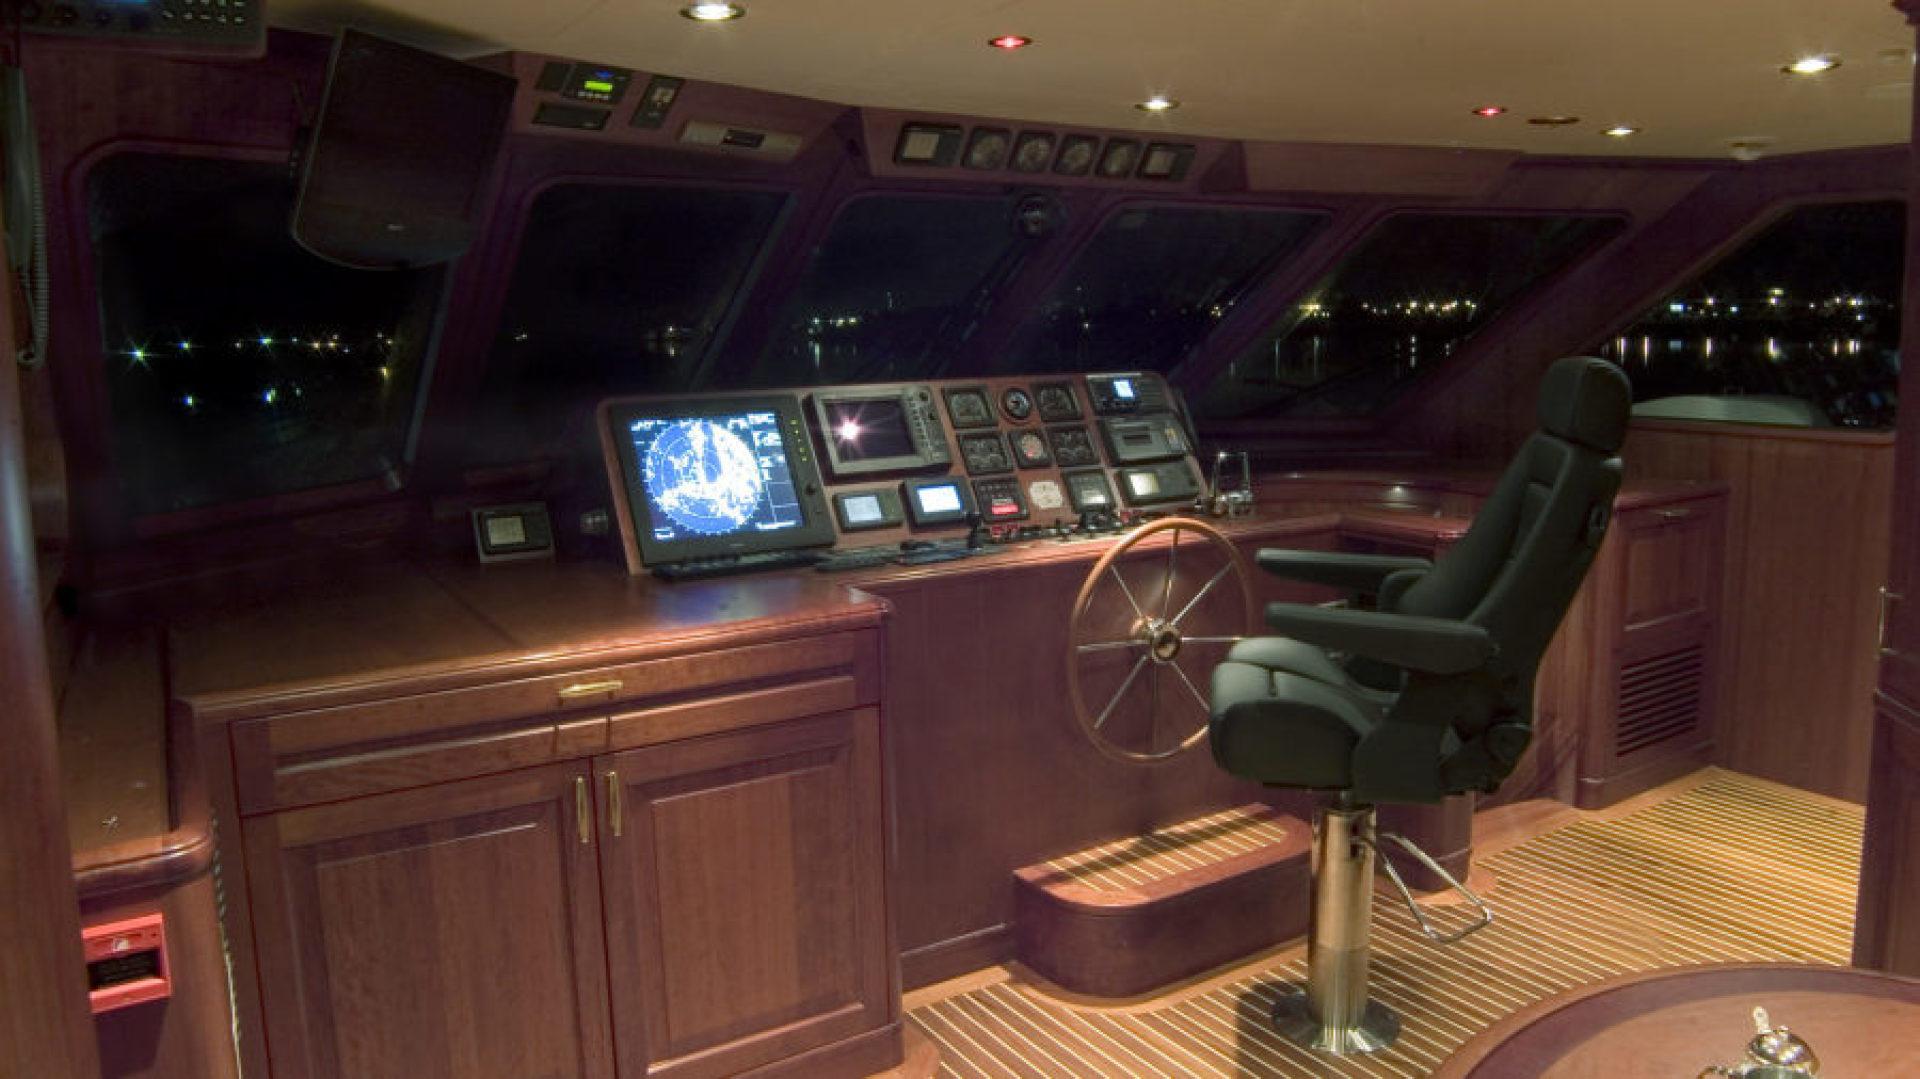 Conrad Shipyard-88 Motor Yacht 2005-Chillin Fort Lauderdale-Florida-United States-Conrad Motor Yacht 2005 Chillin-1537342 | Thumbnail